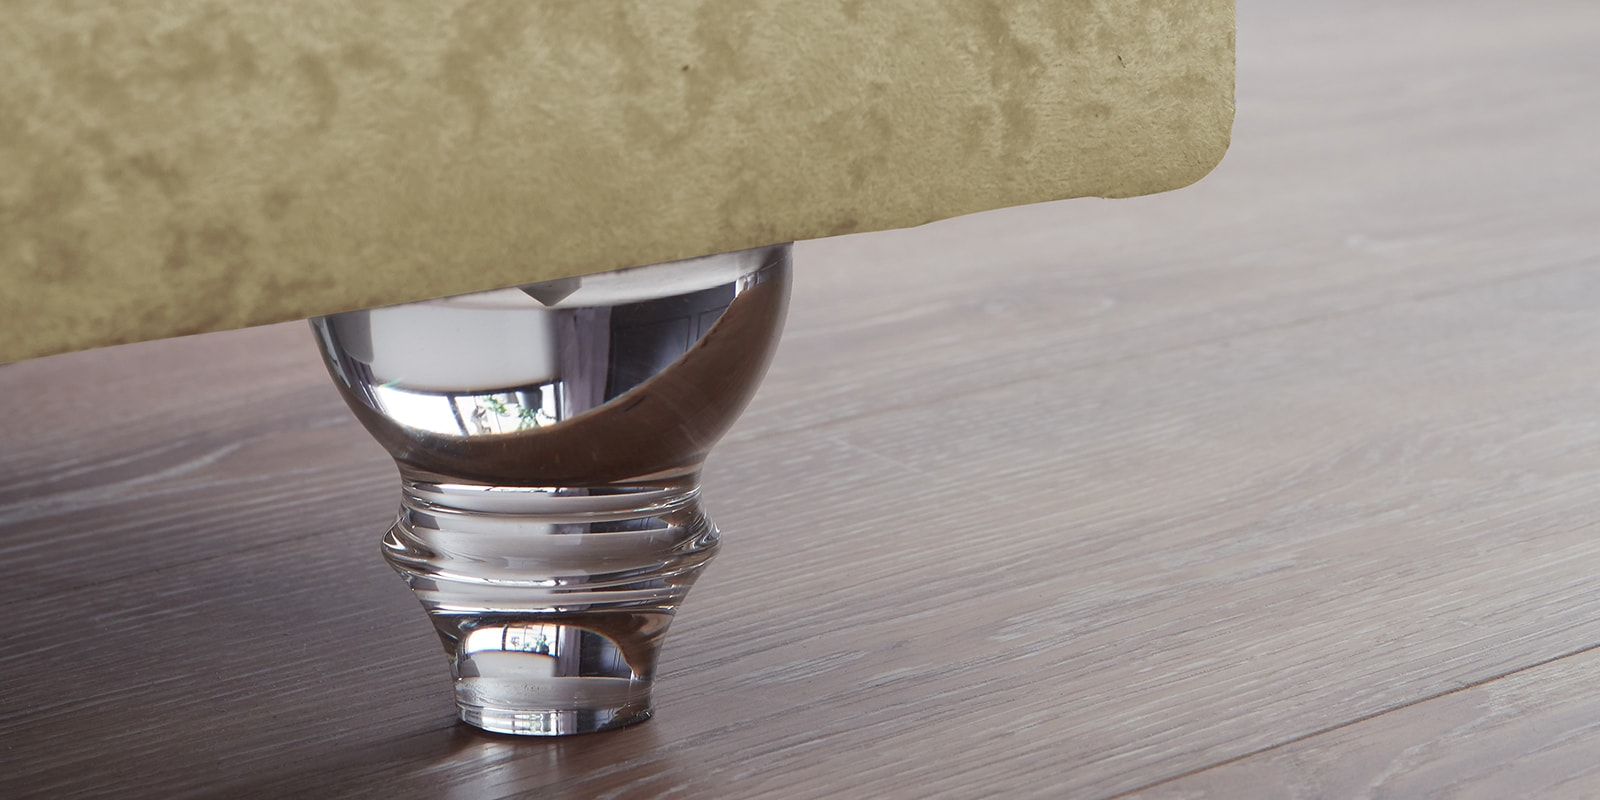 Moebella24 - Boxspringbett Roma - Chesterfield Stil mit Knopfheftung - samt gold - Acryl Füße in Glasoptik